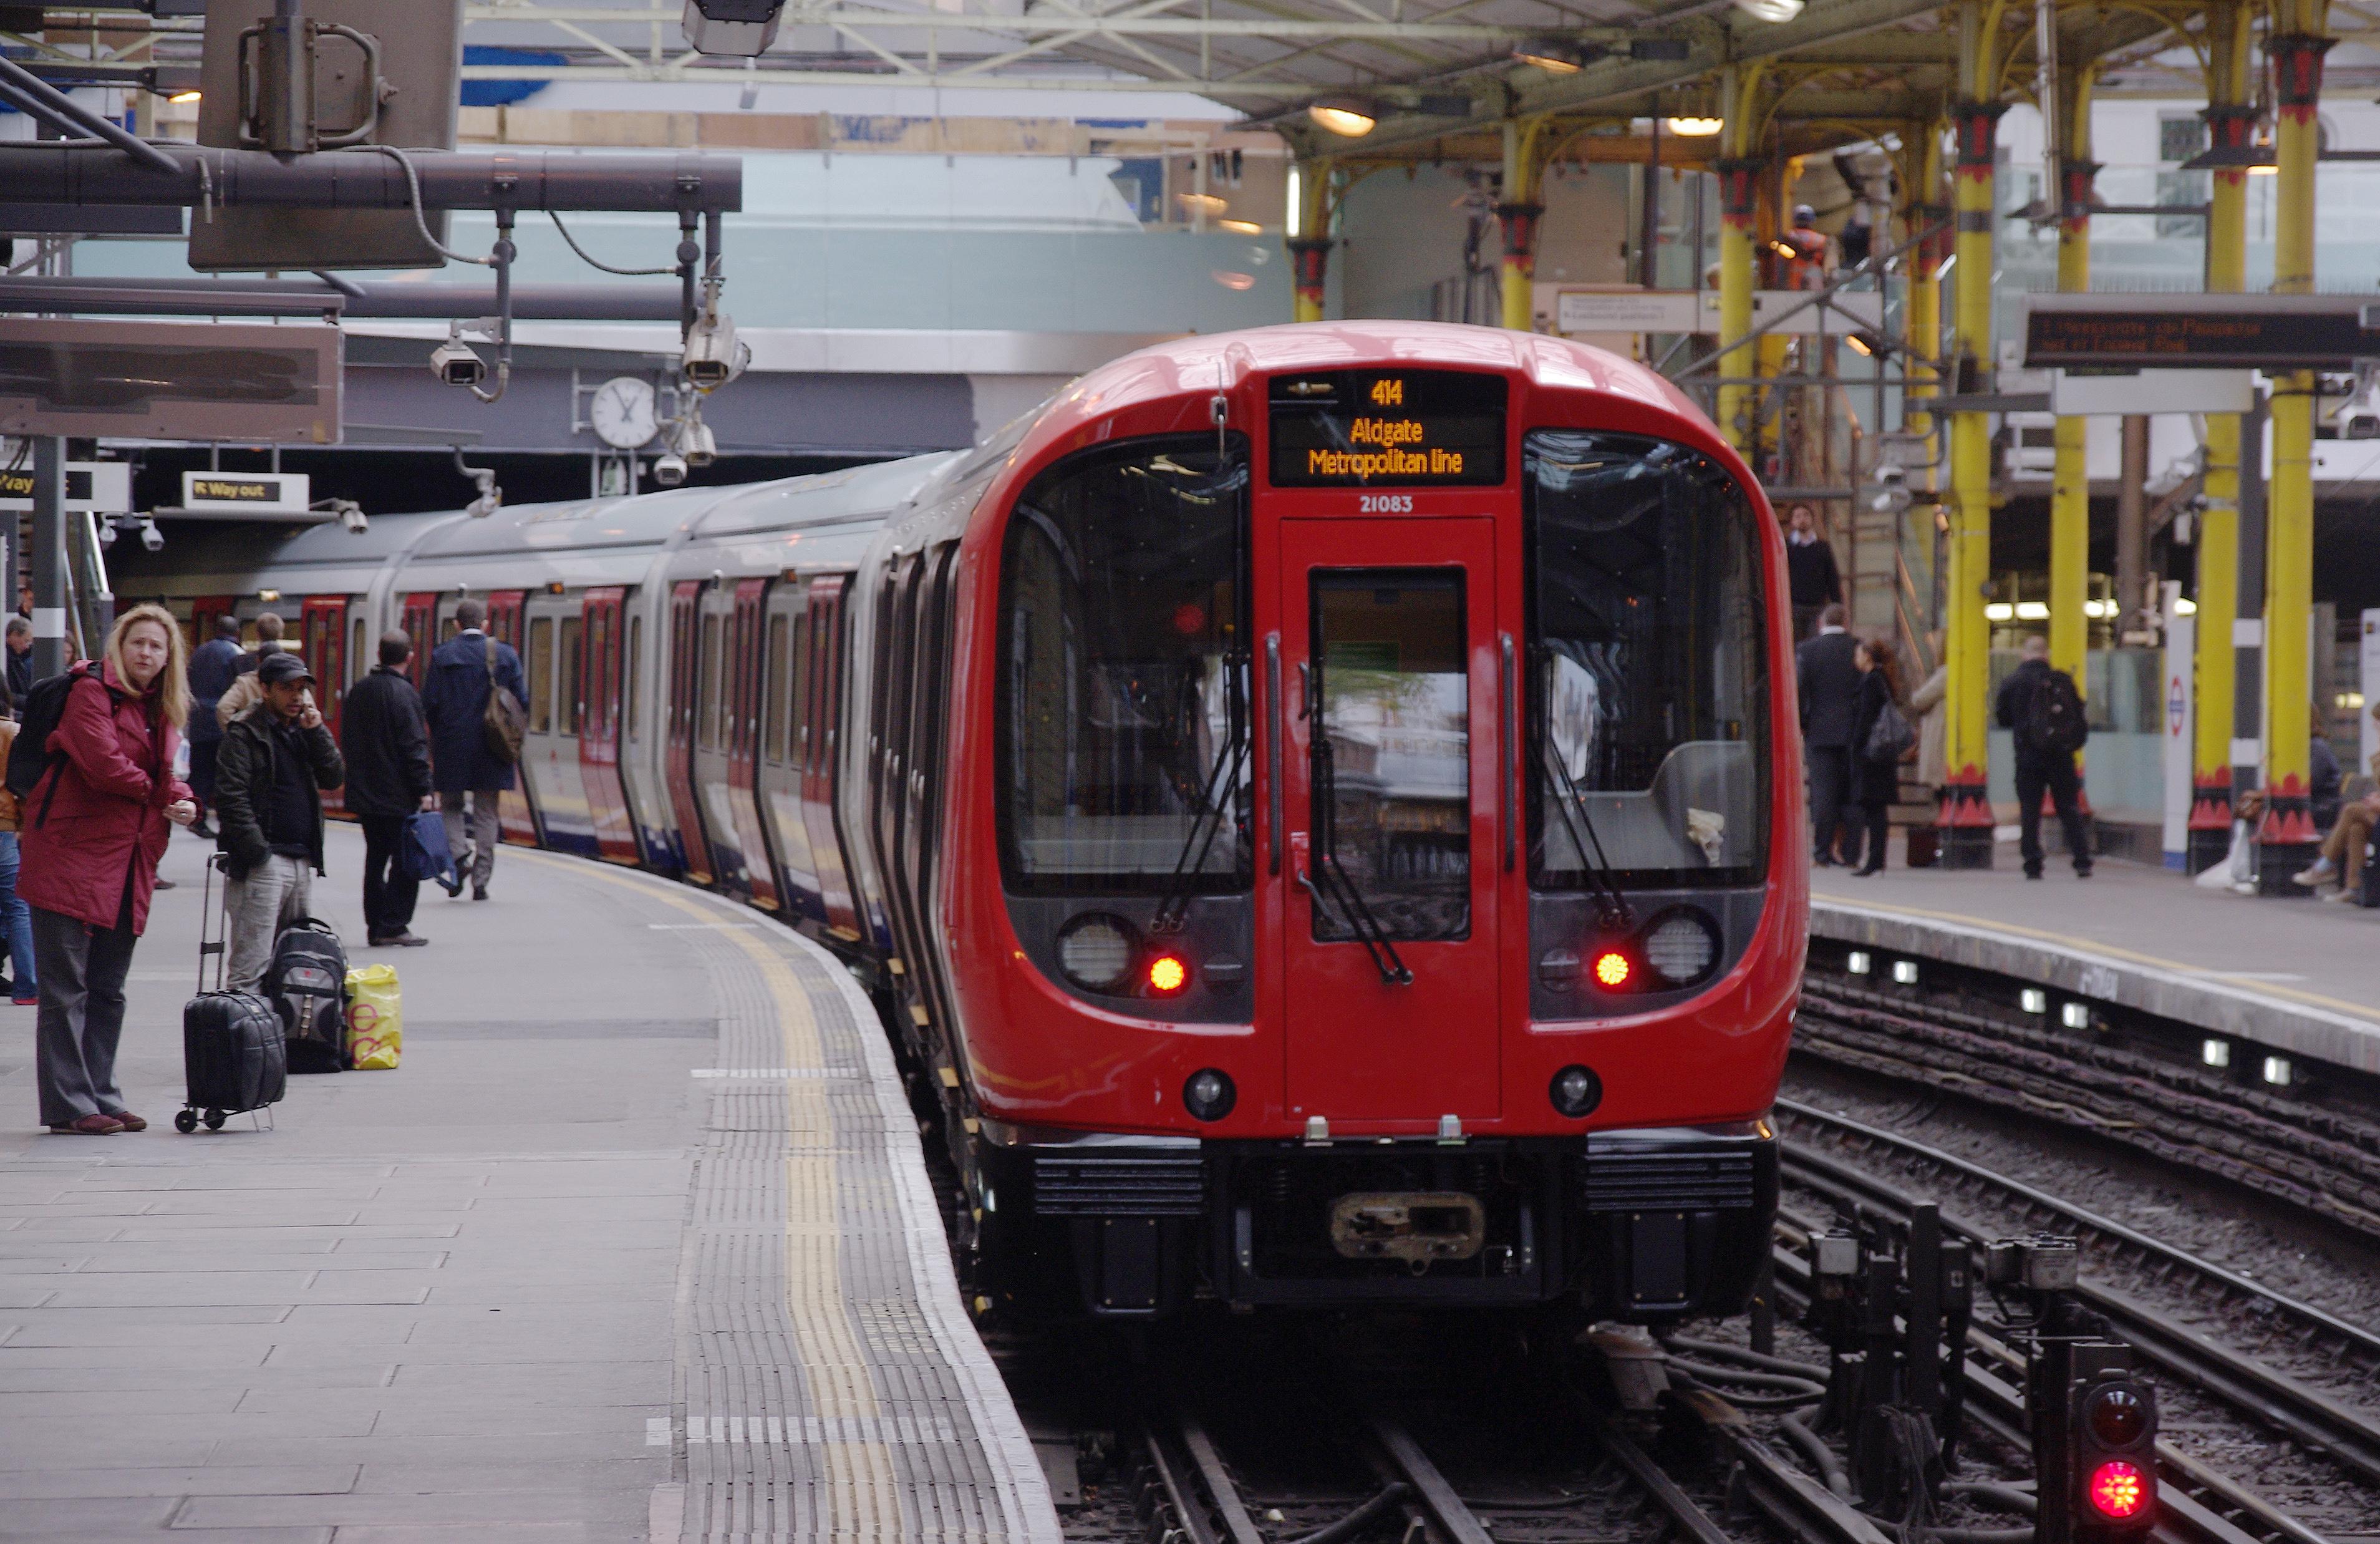 Farringdon_station_MMB_22_S-Stock.jpg